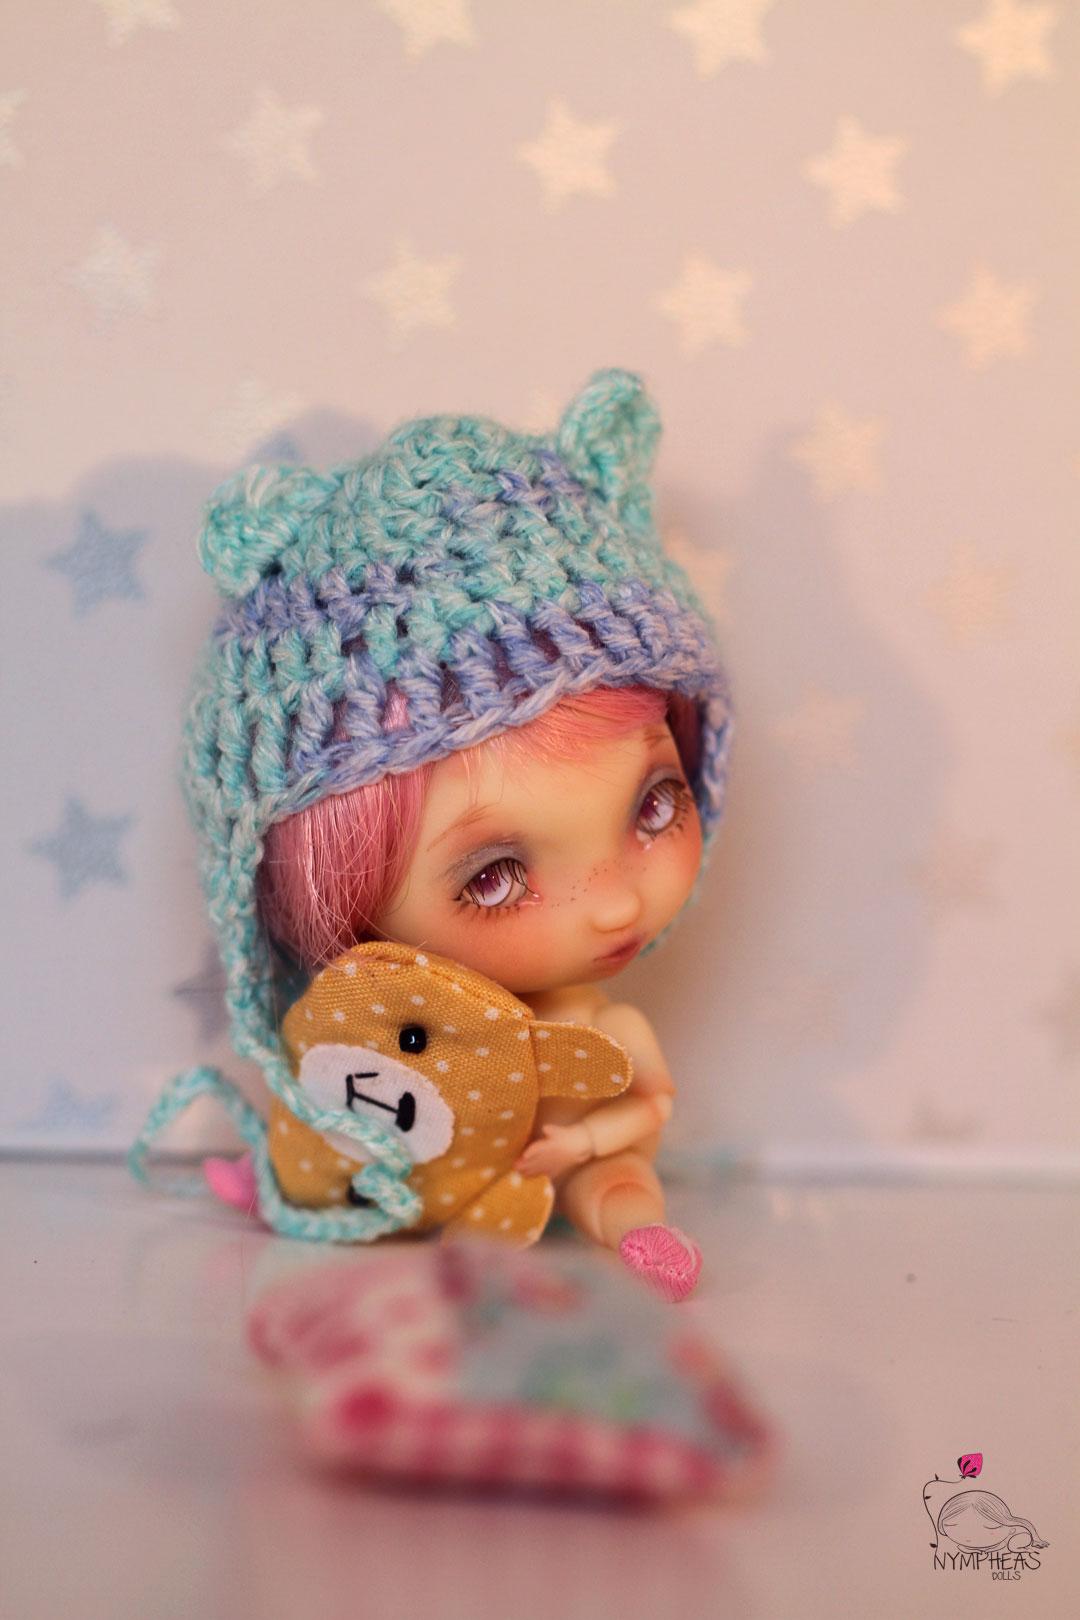 [Nympheas dolls] pinup choice & nouvelle demoiselle : Yali p5 IMG_4938